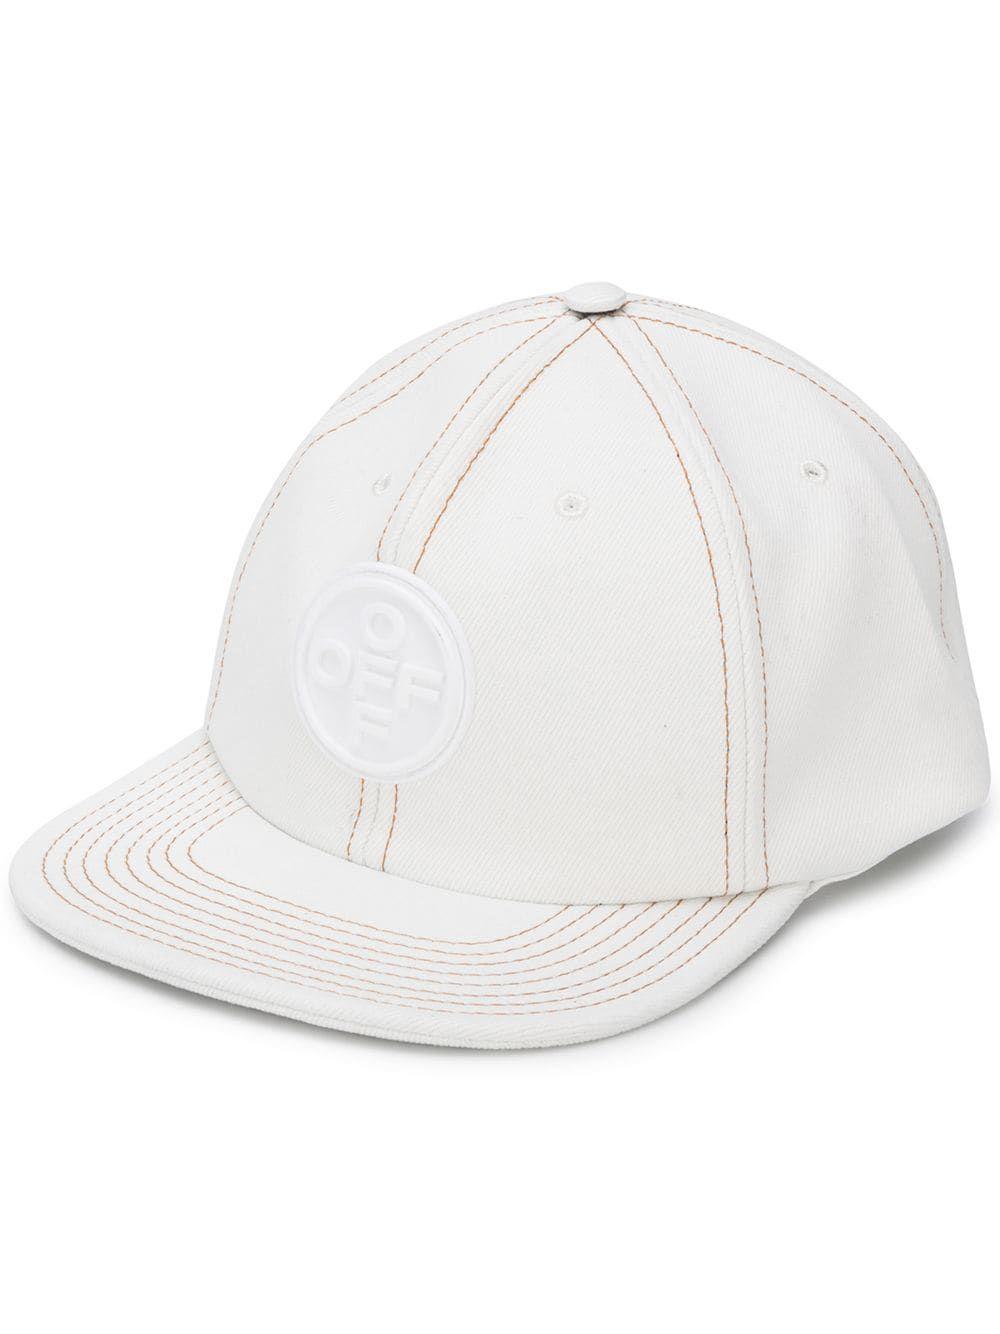 9abc489376d0d8 OFF-WHITE OFF-WHITE LOGO BASEBALL CAP. #off-white | Off-White in ...